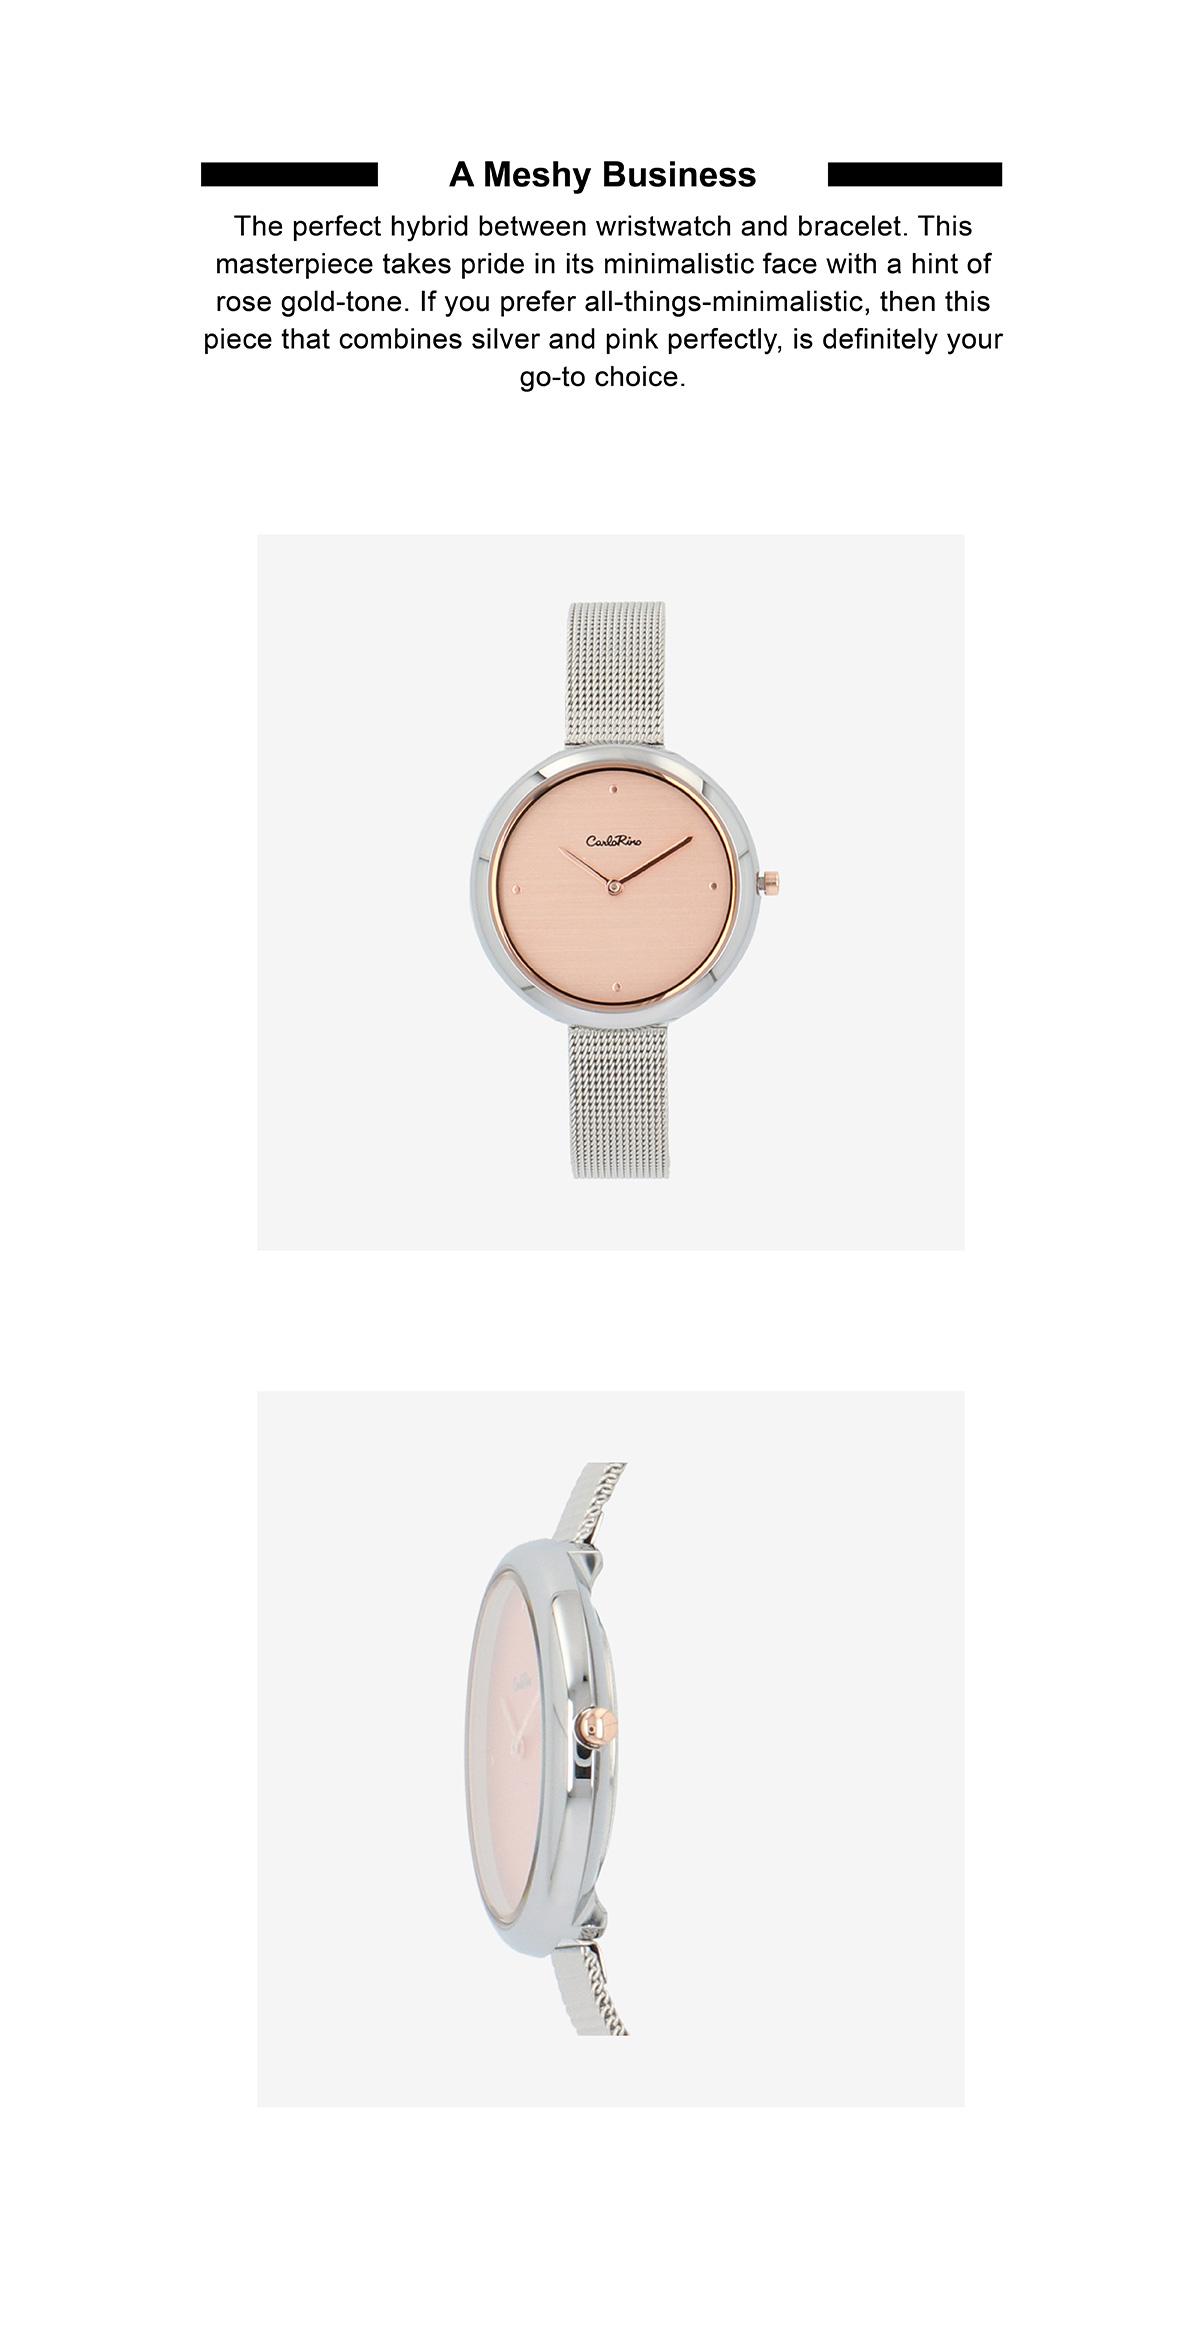 A93301 G019 12 02 - A Meshy Business Mesh Band Timepiece